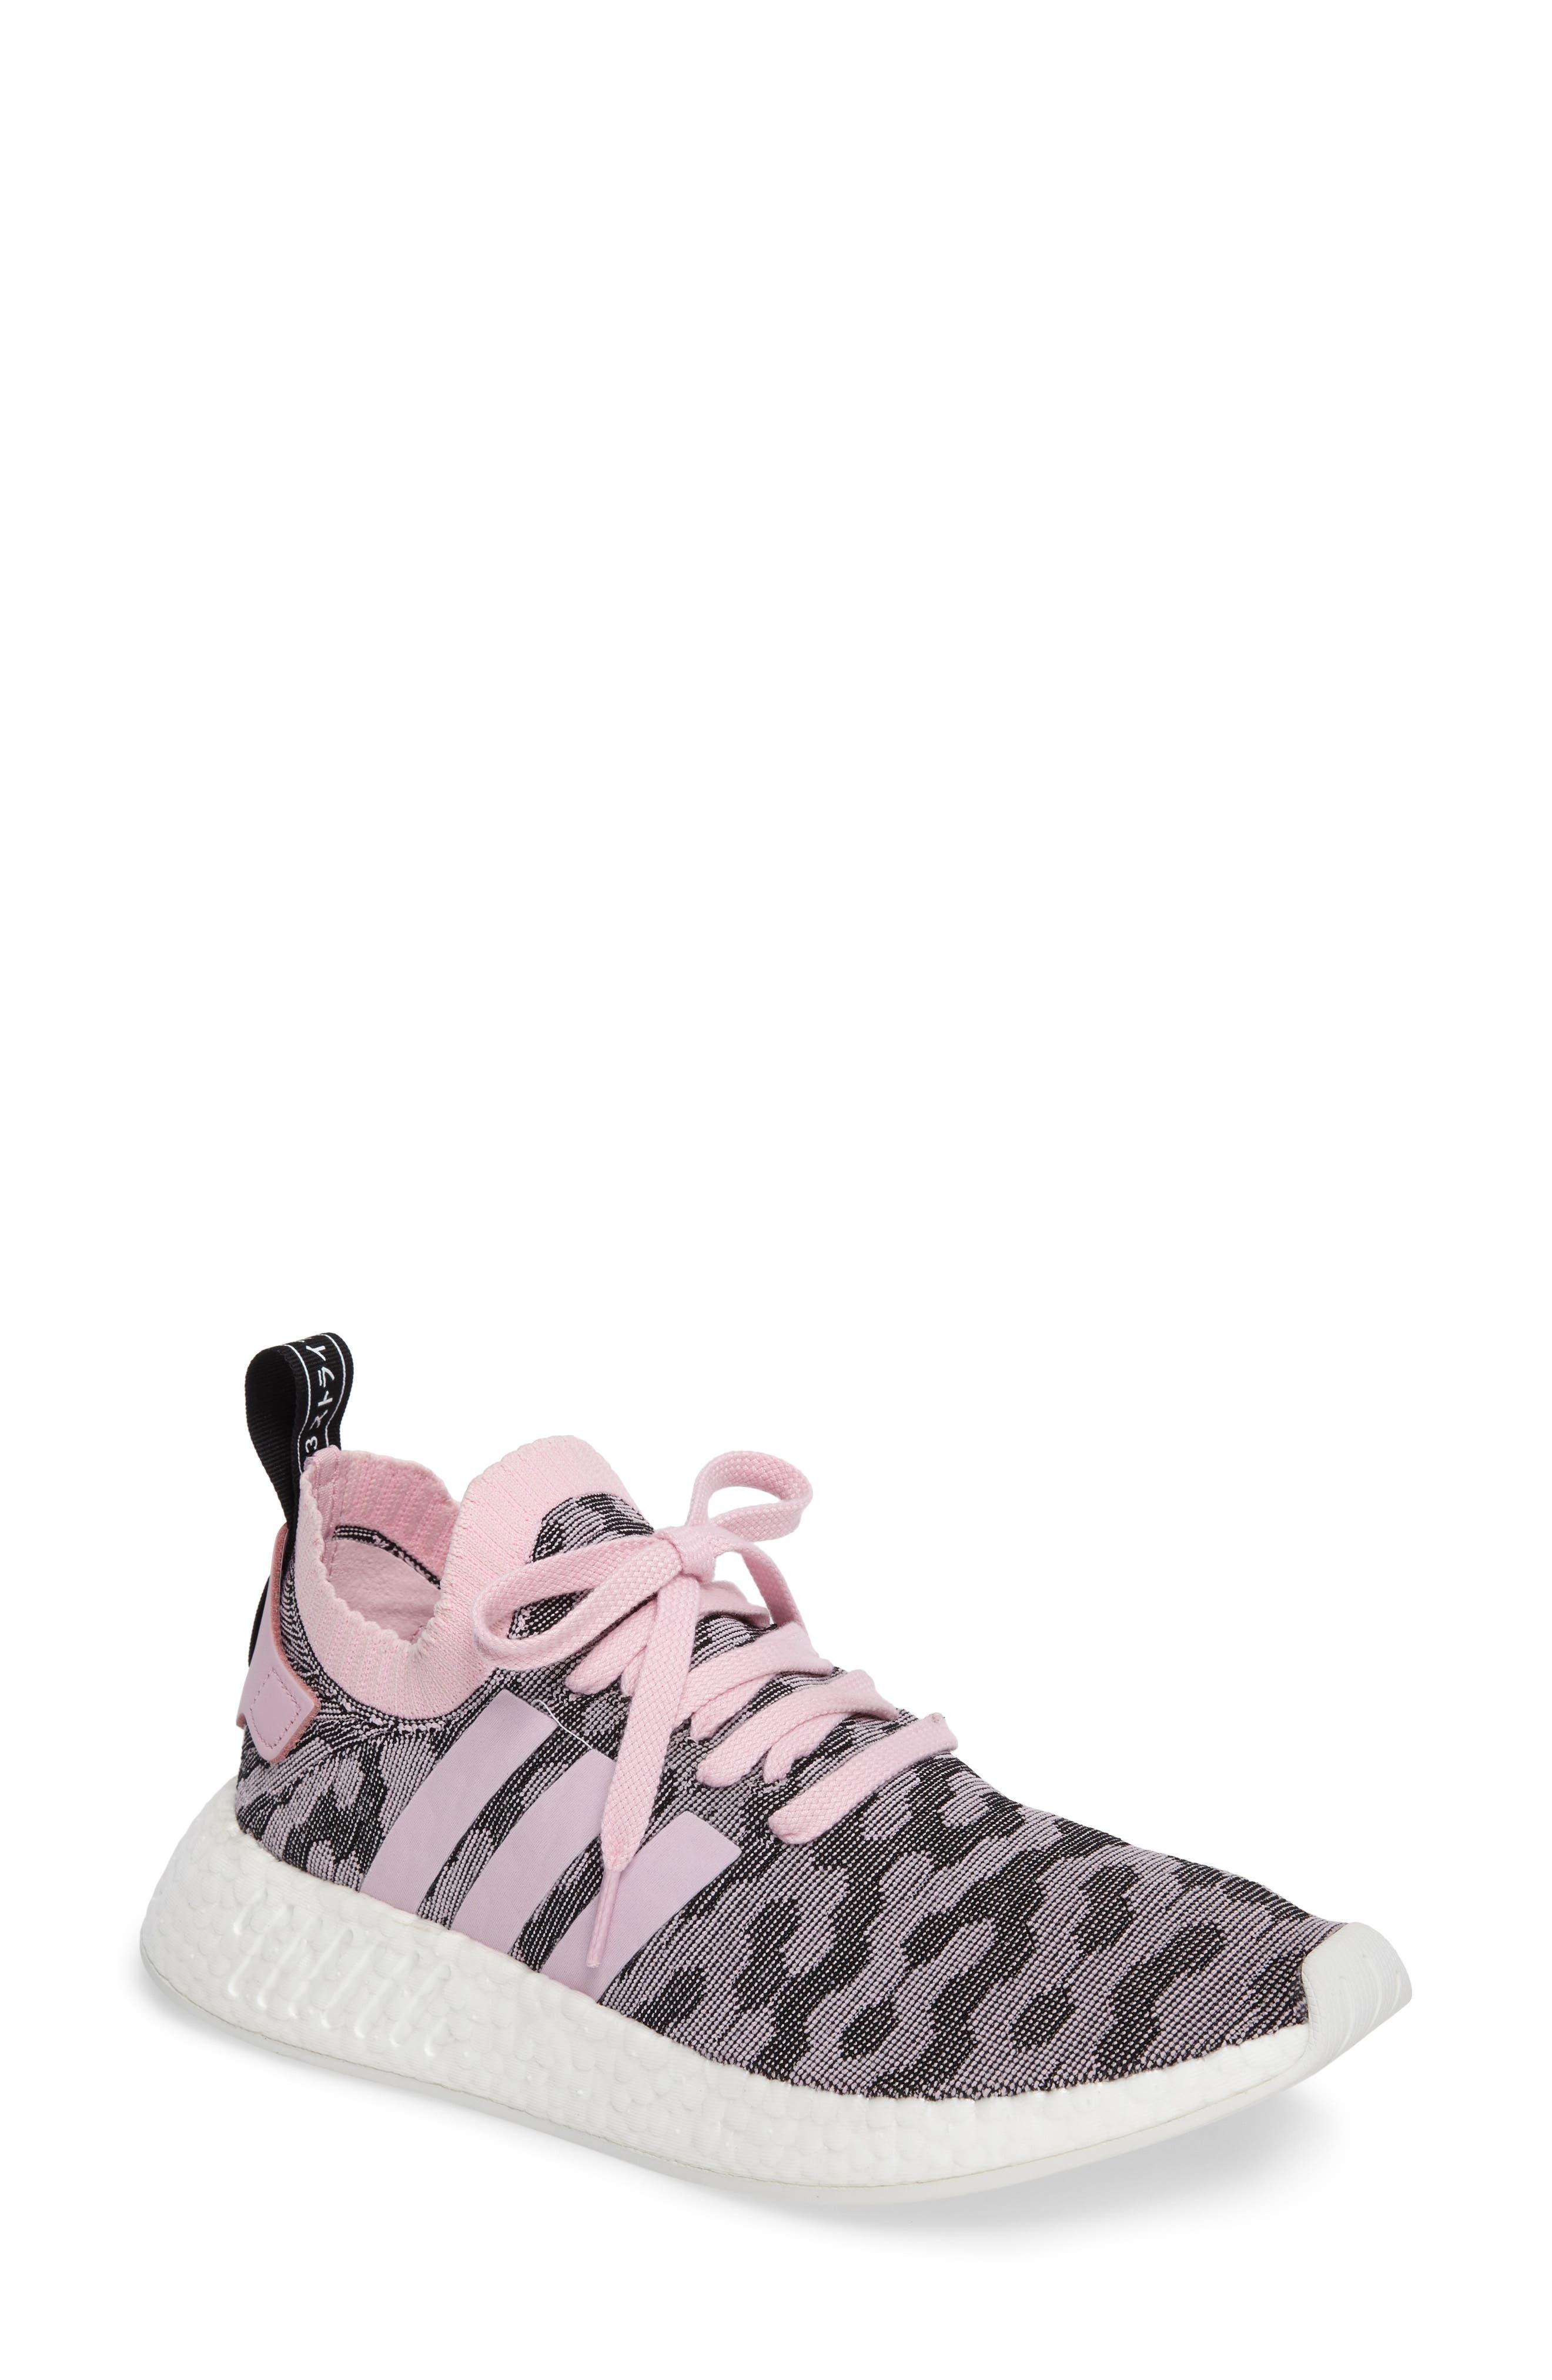 NMD R2 Primeknit Athletic Shoe,                             Main thumbnail 5, color,